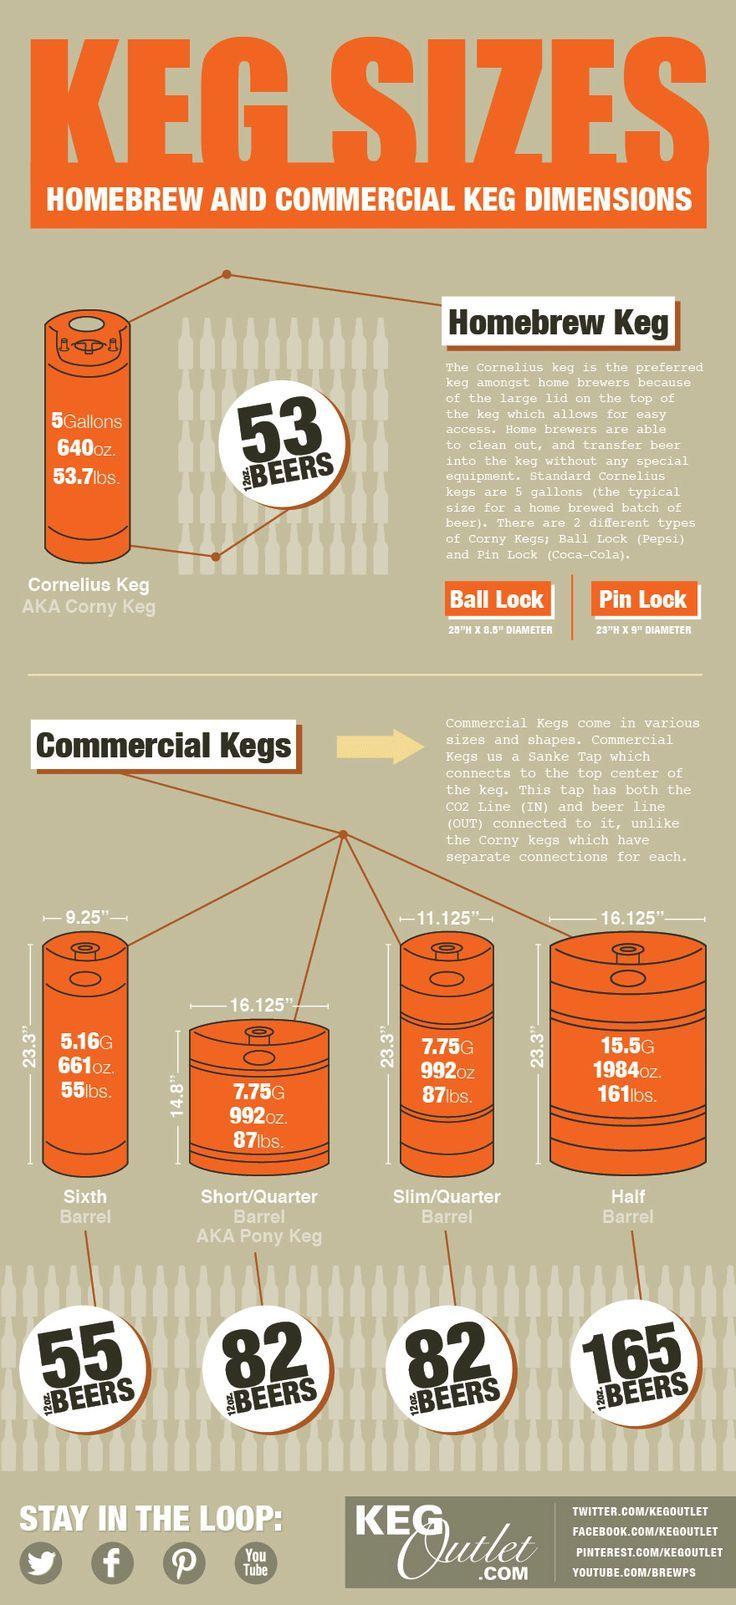 Keg types and sizes.